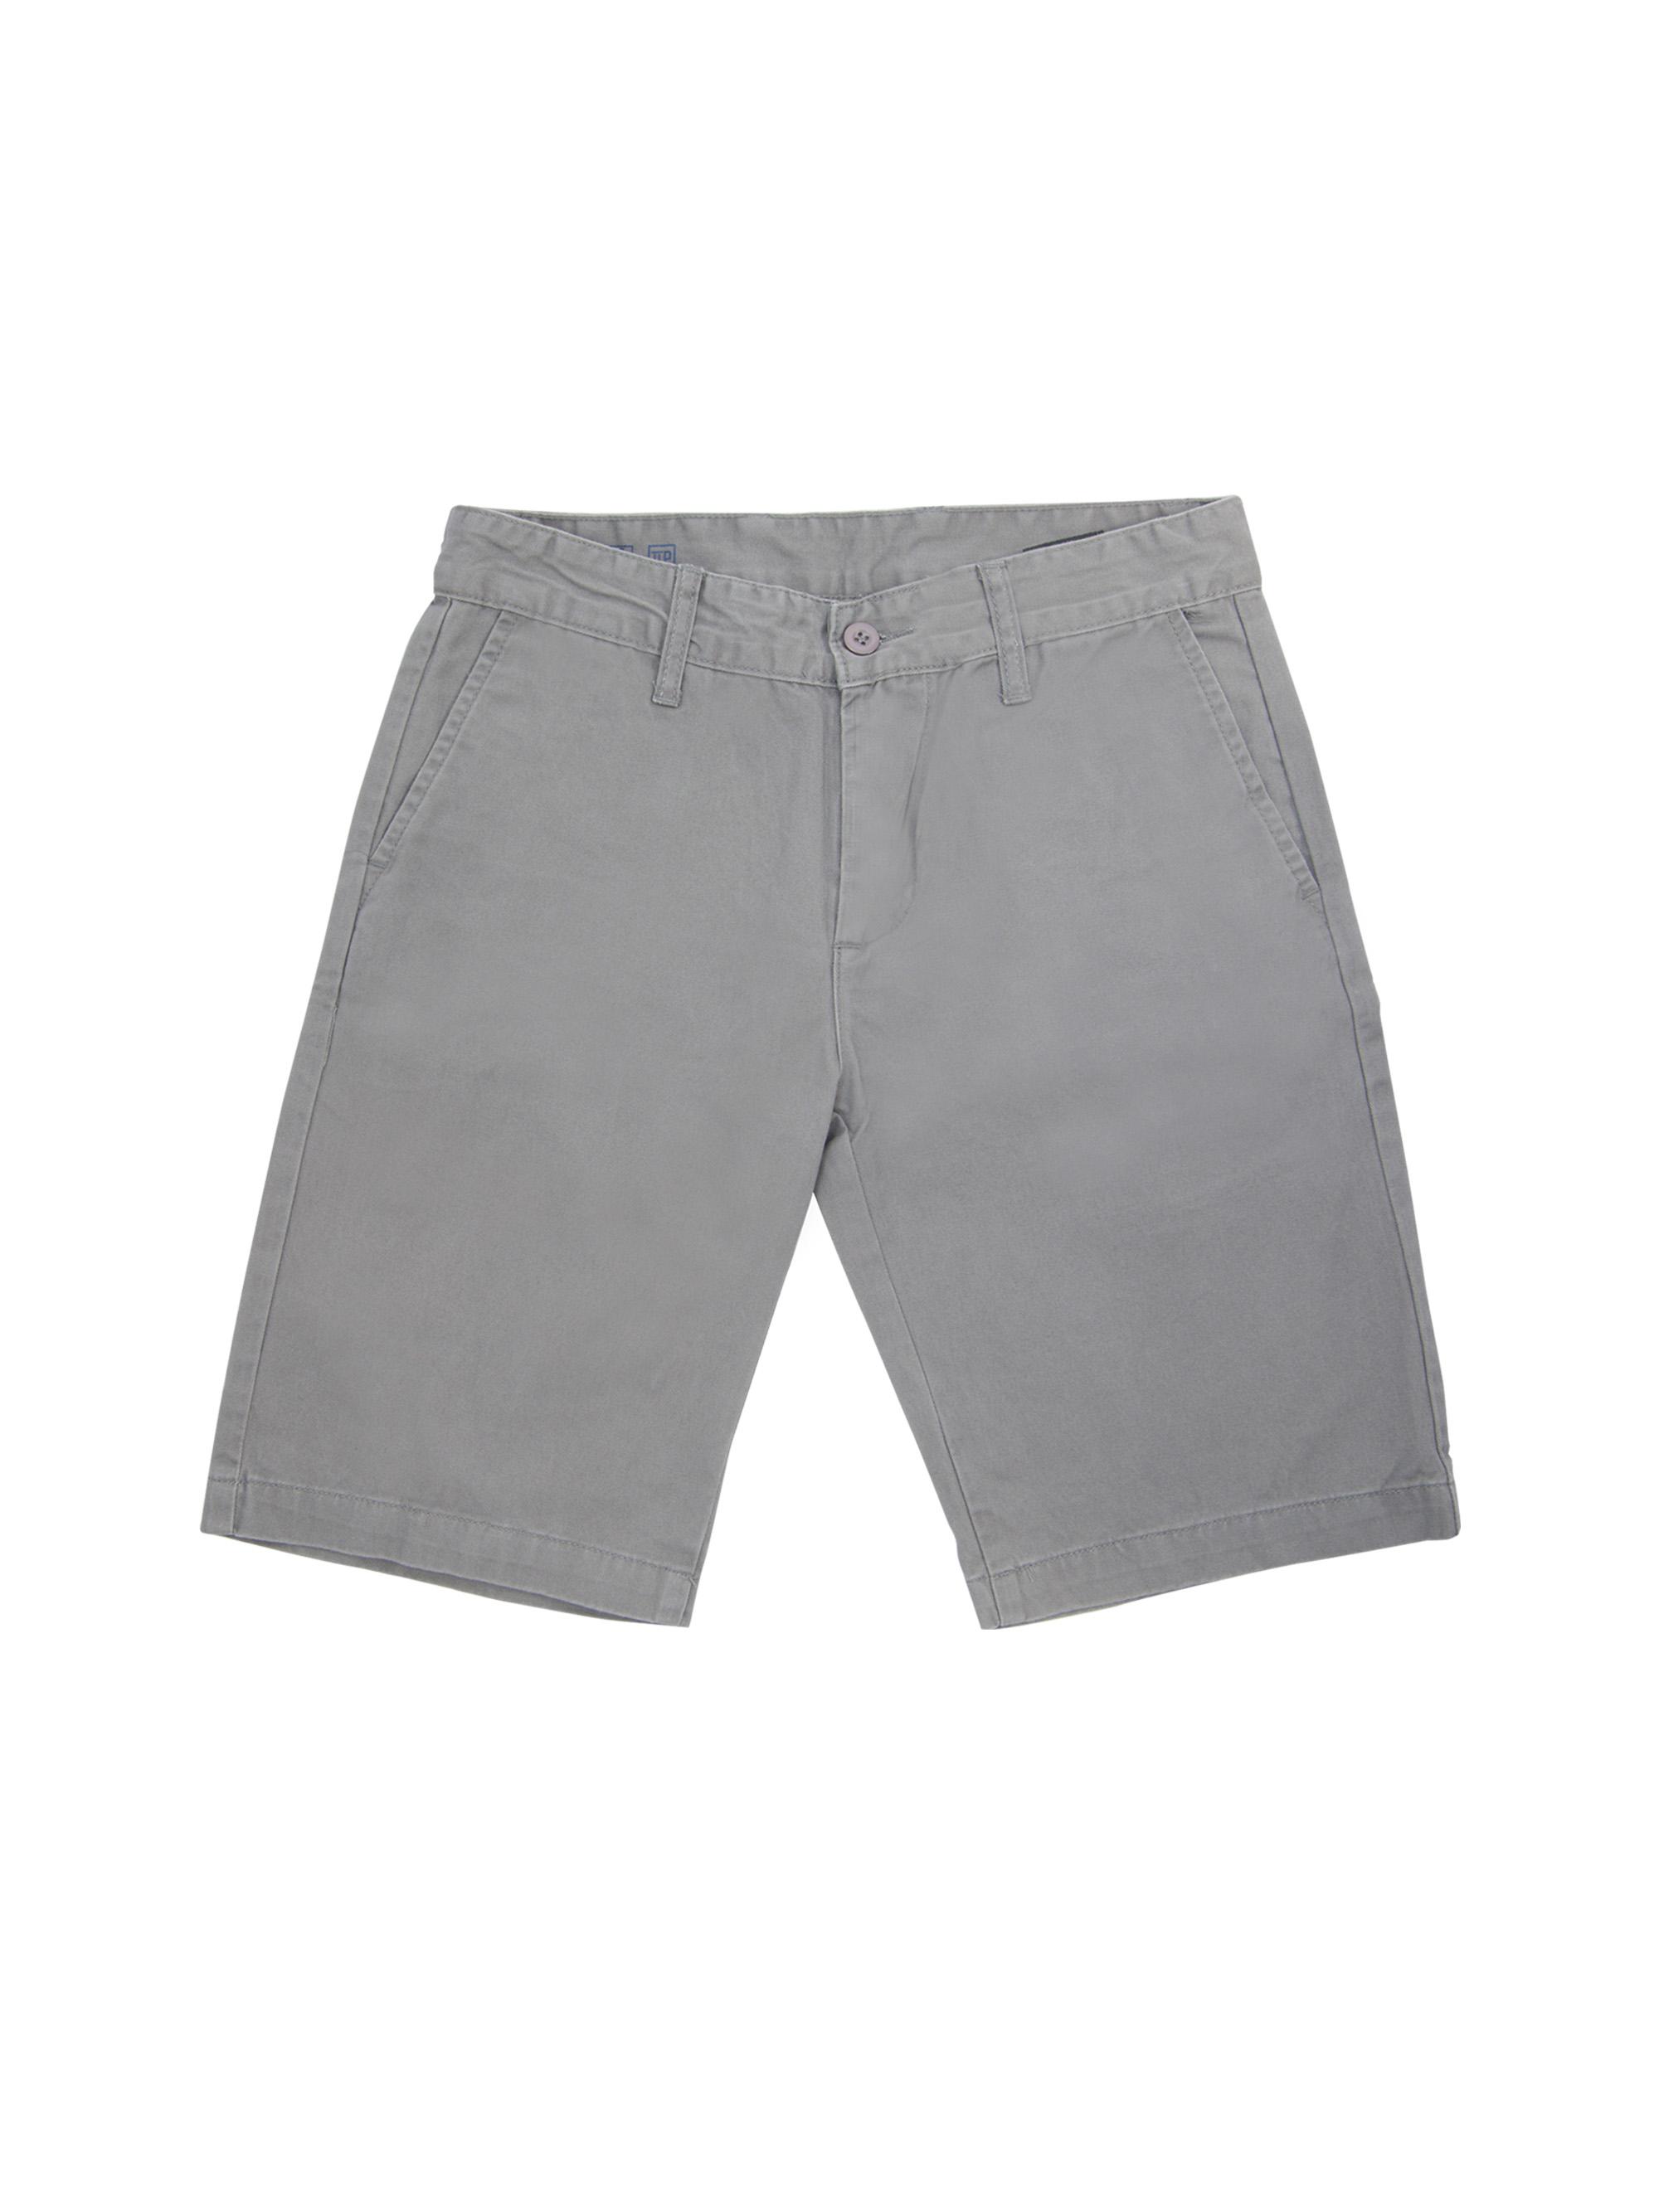 aac6e2f63e7b8 TLP Short Bermuda Hombre Gris